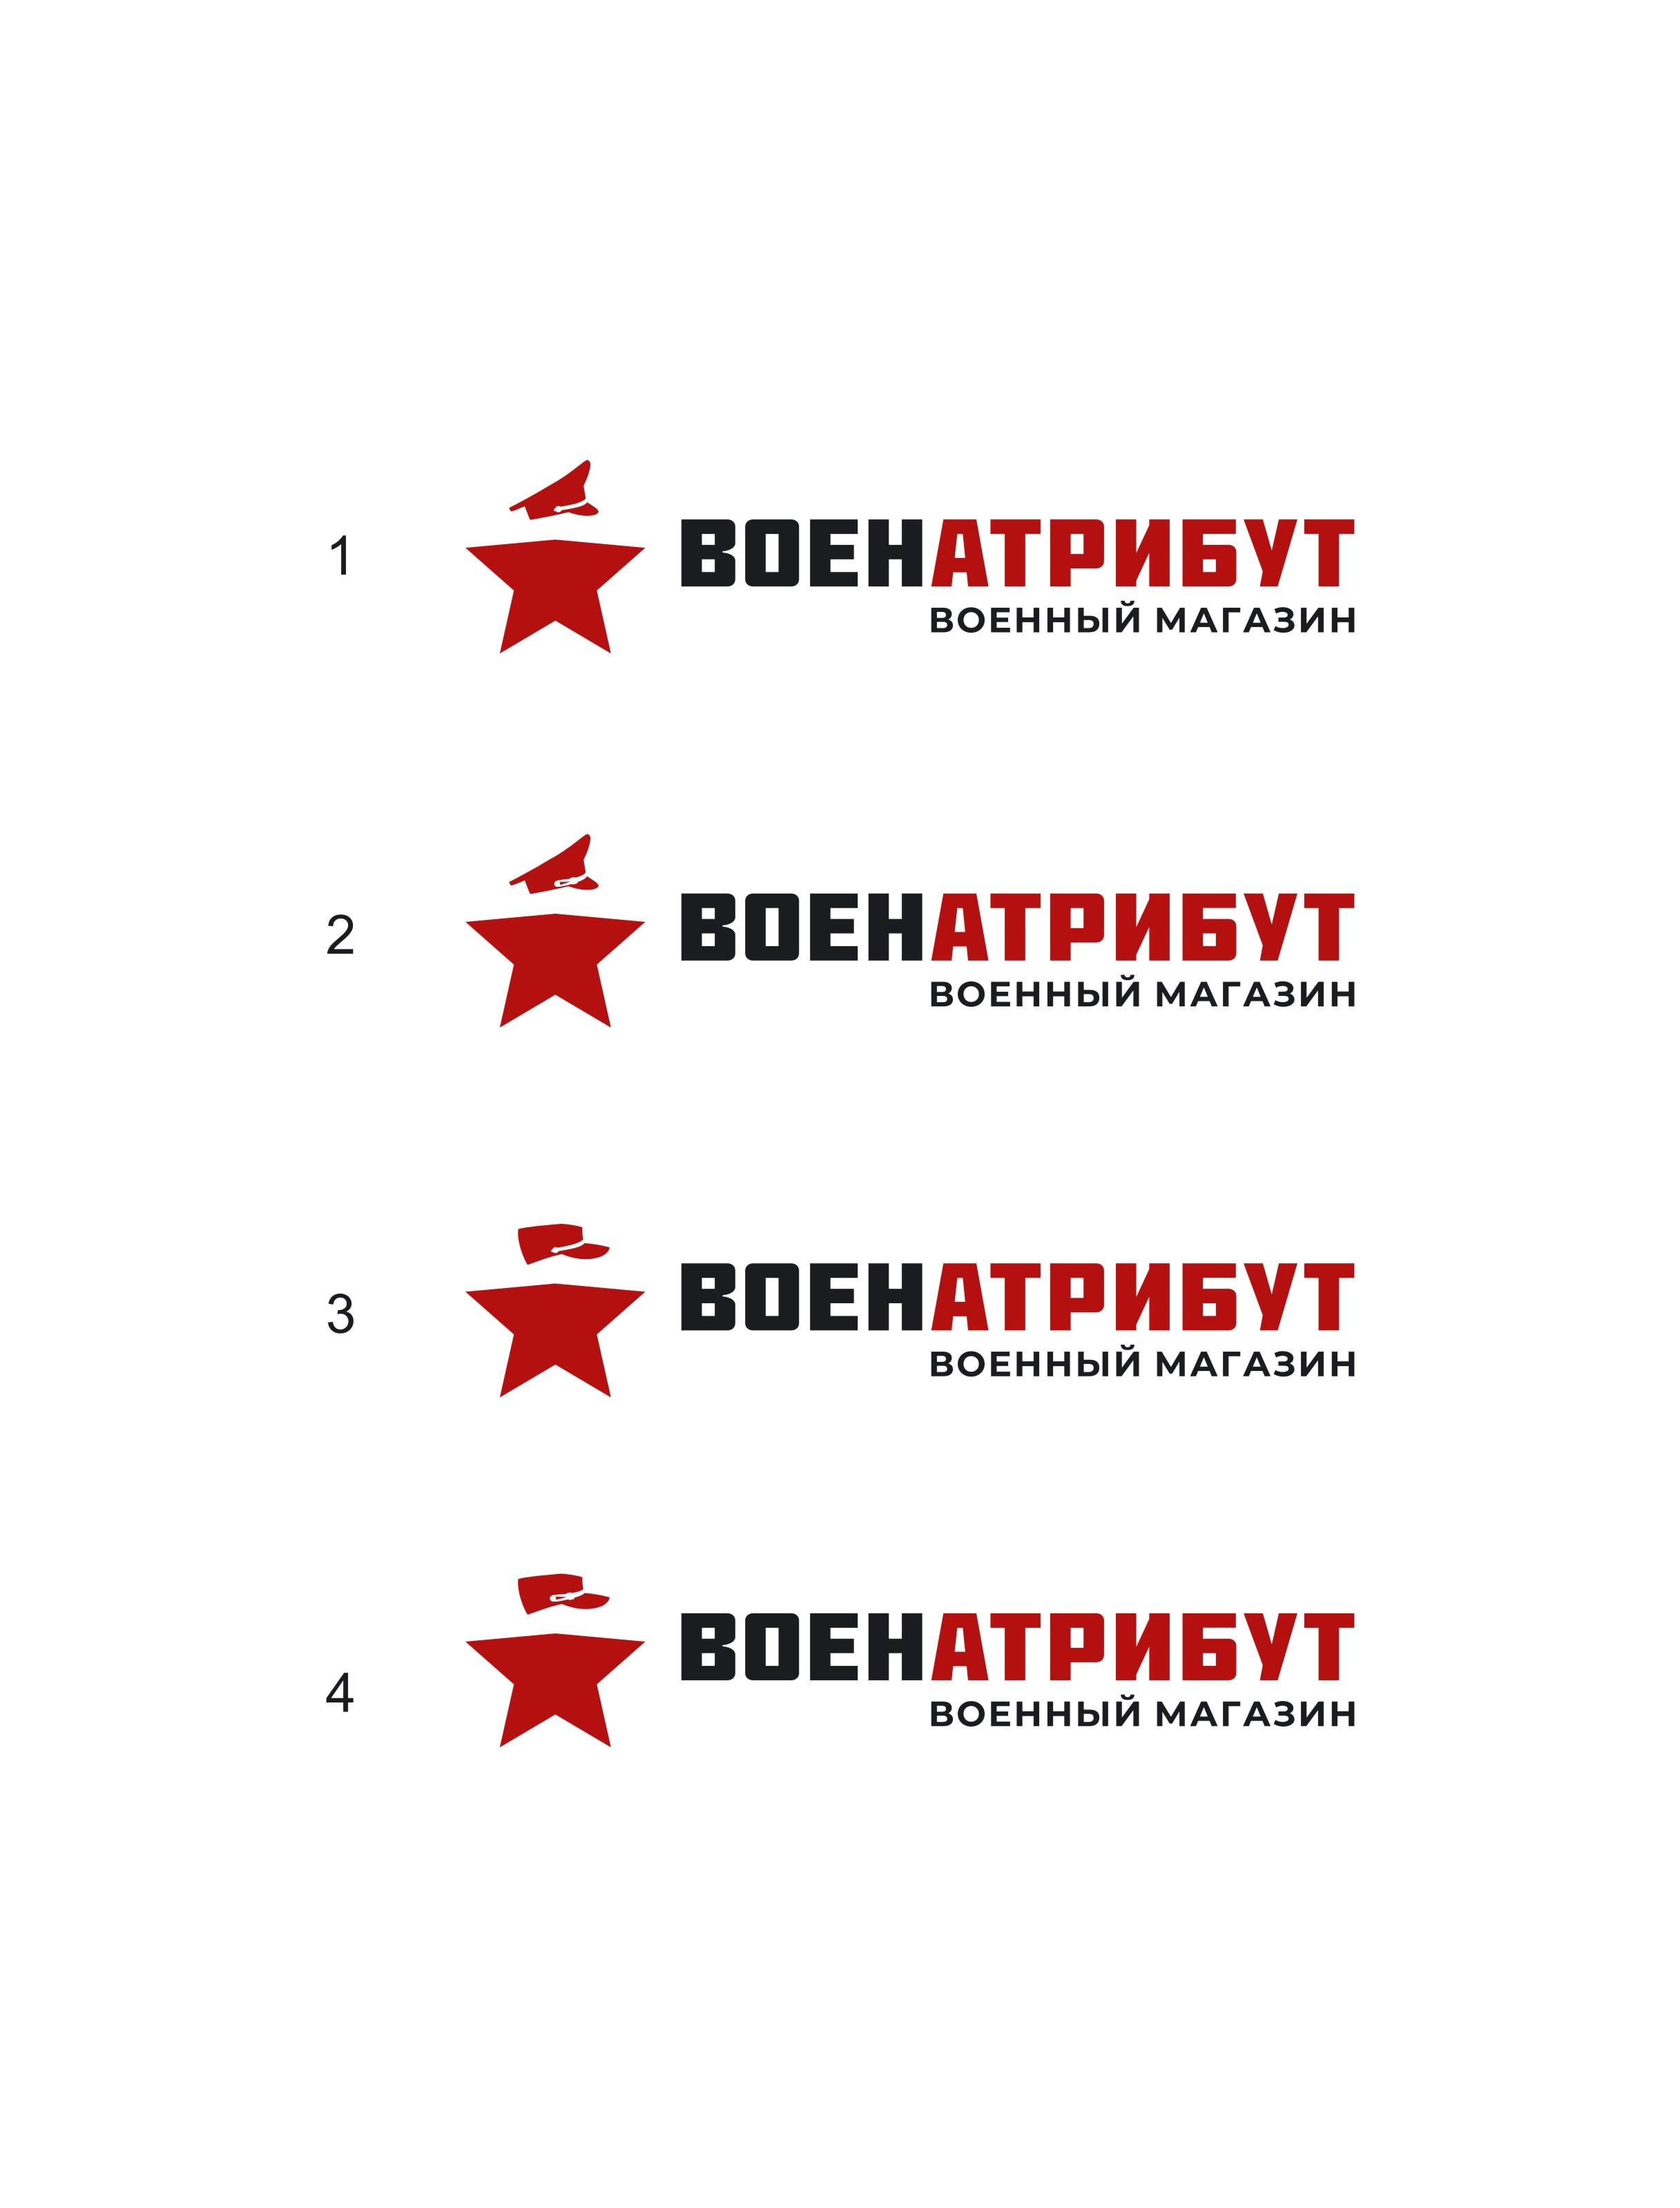 Разработка логотипа для компании военной тематики фото f_357602235a67ae6b.jpg